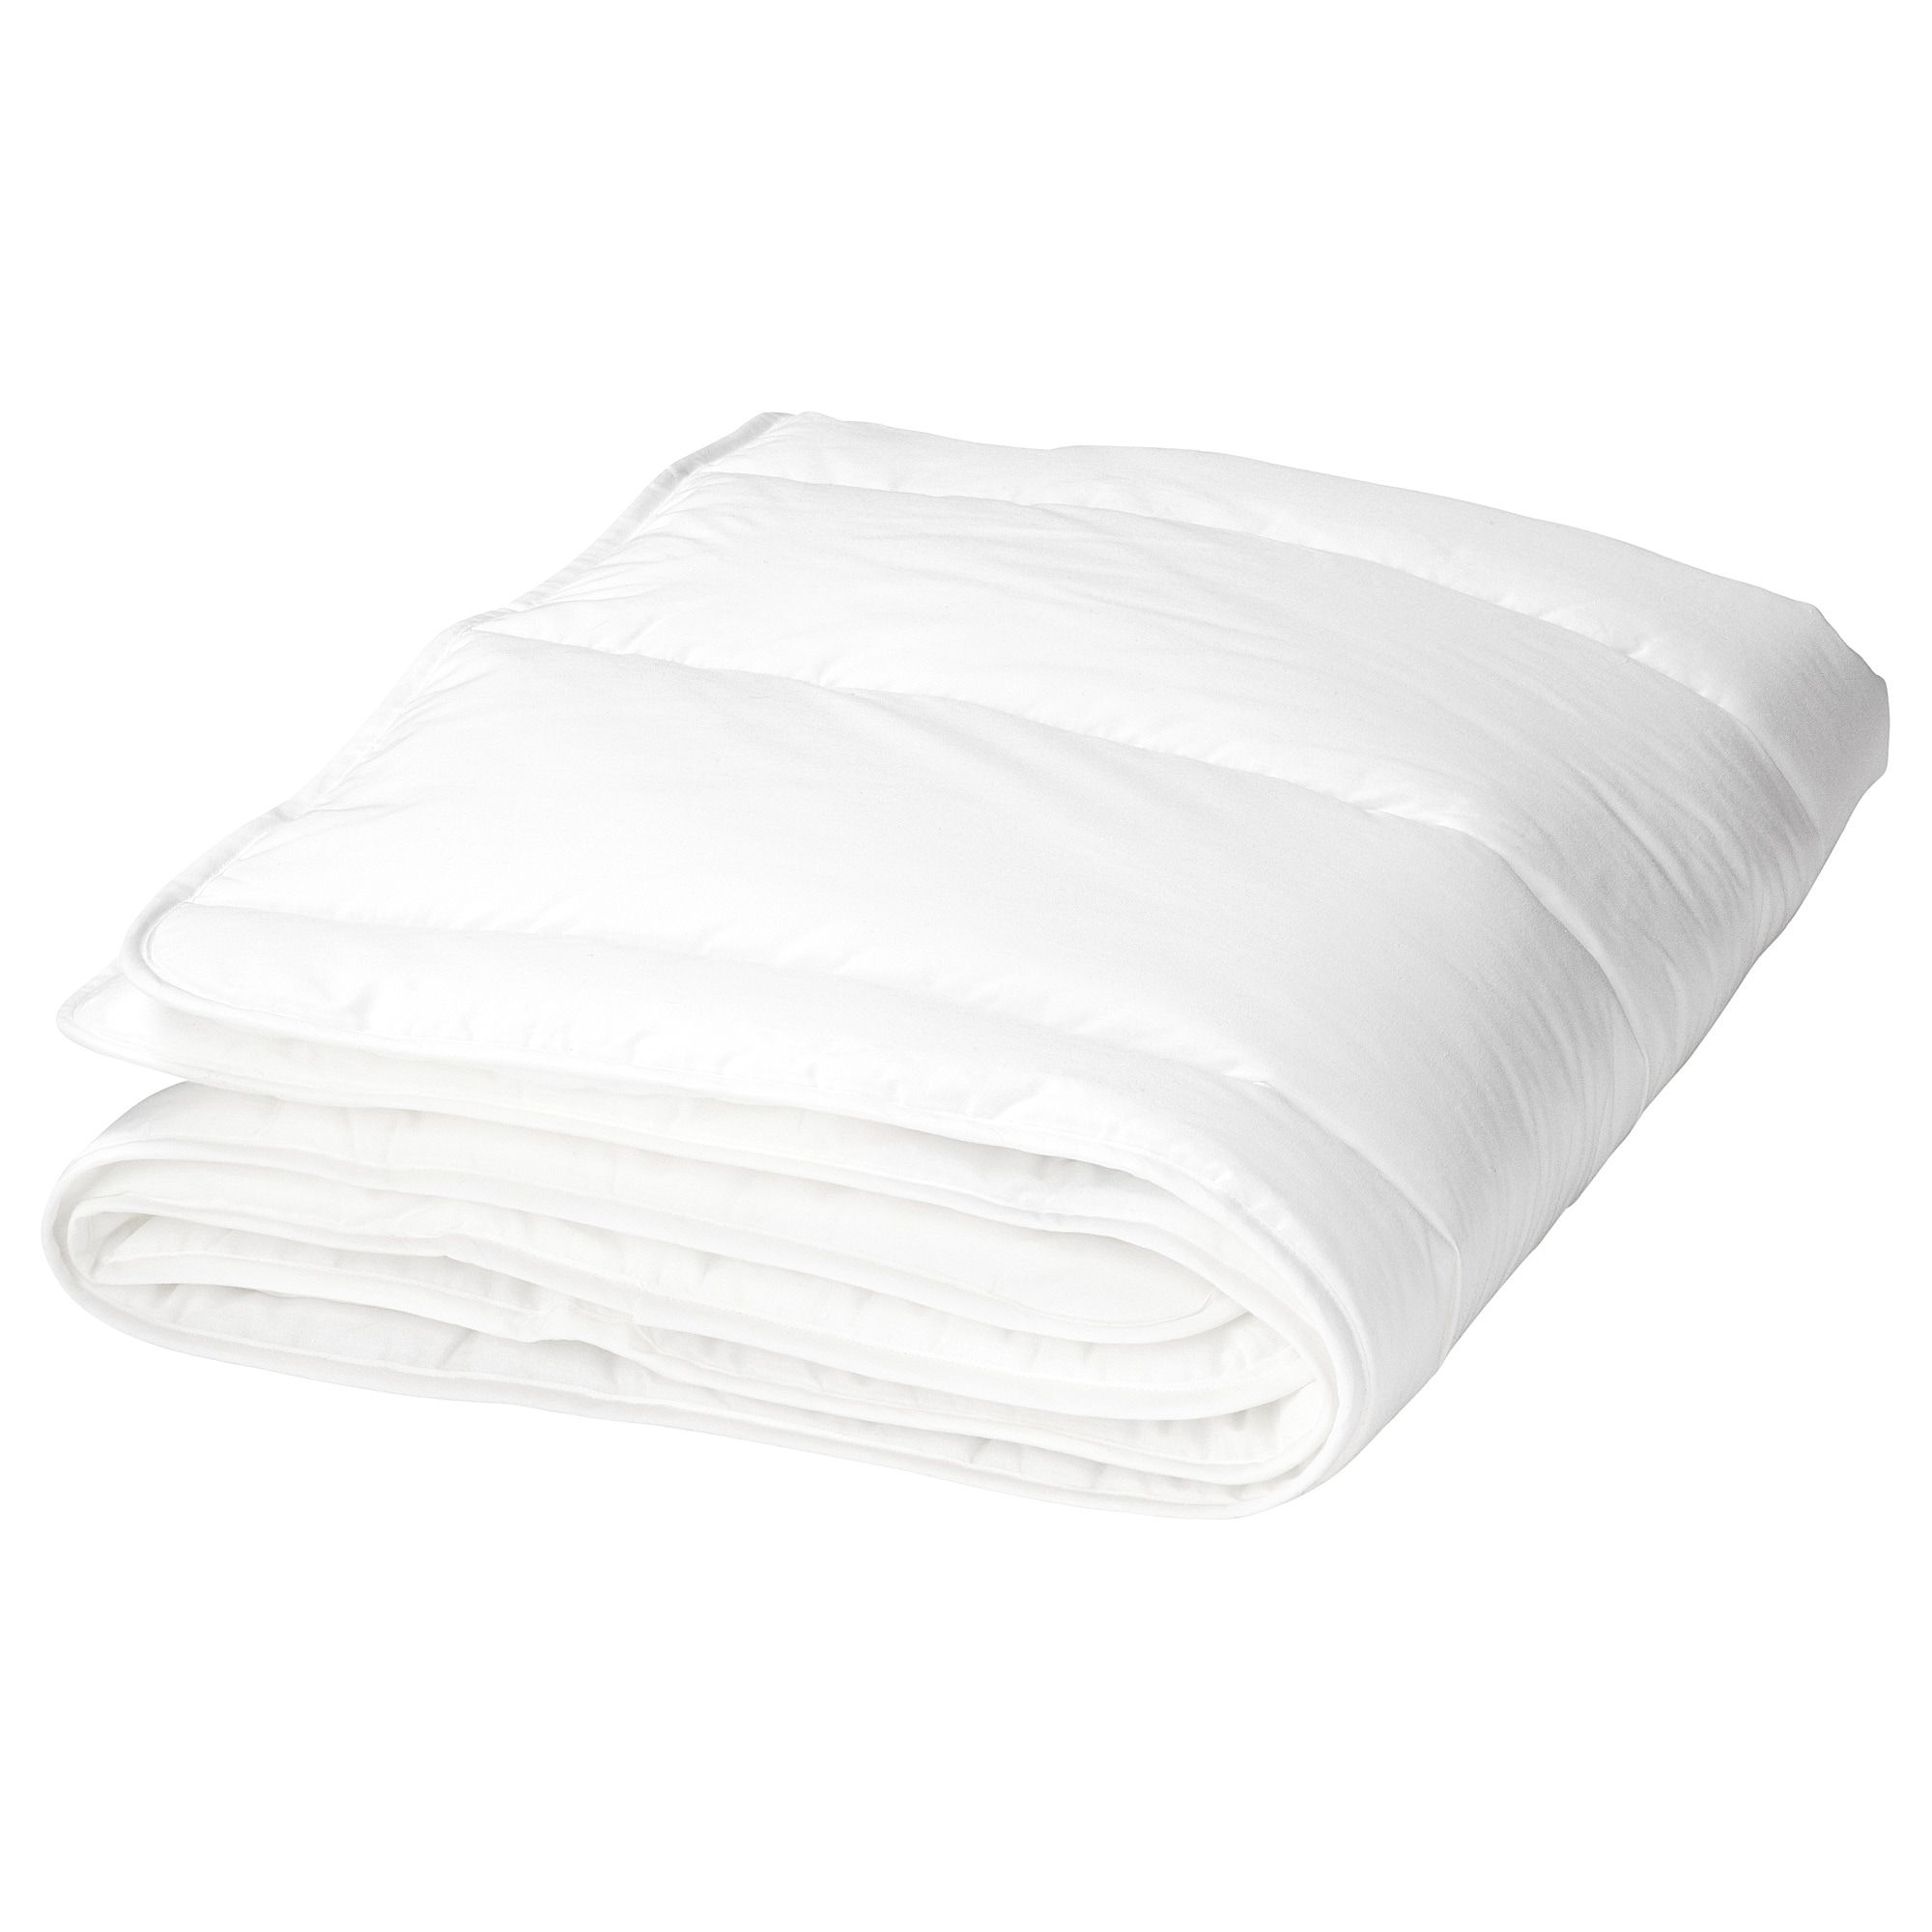 LEN Crib comforter, white, 43x49 - IKEA